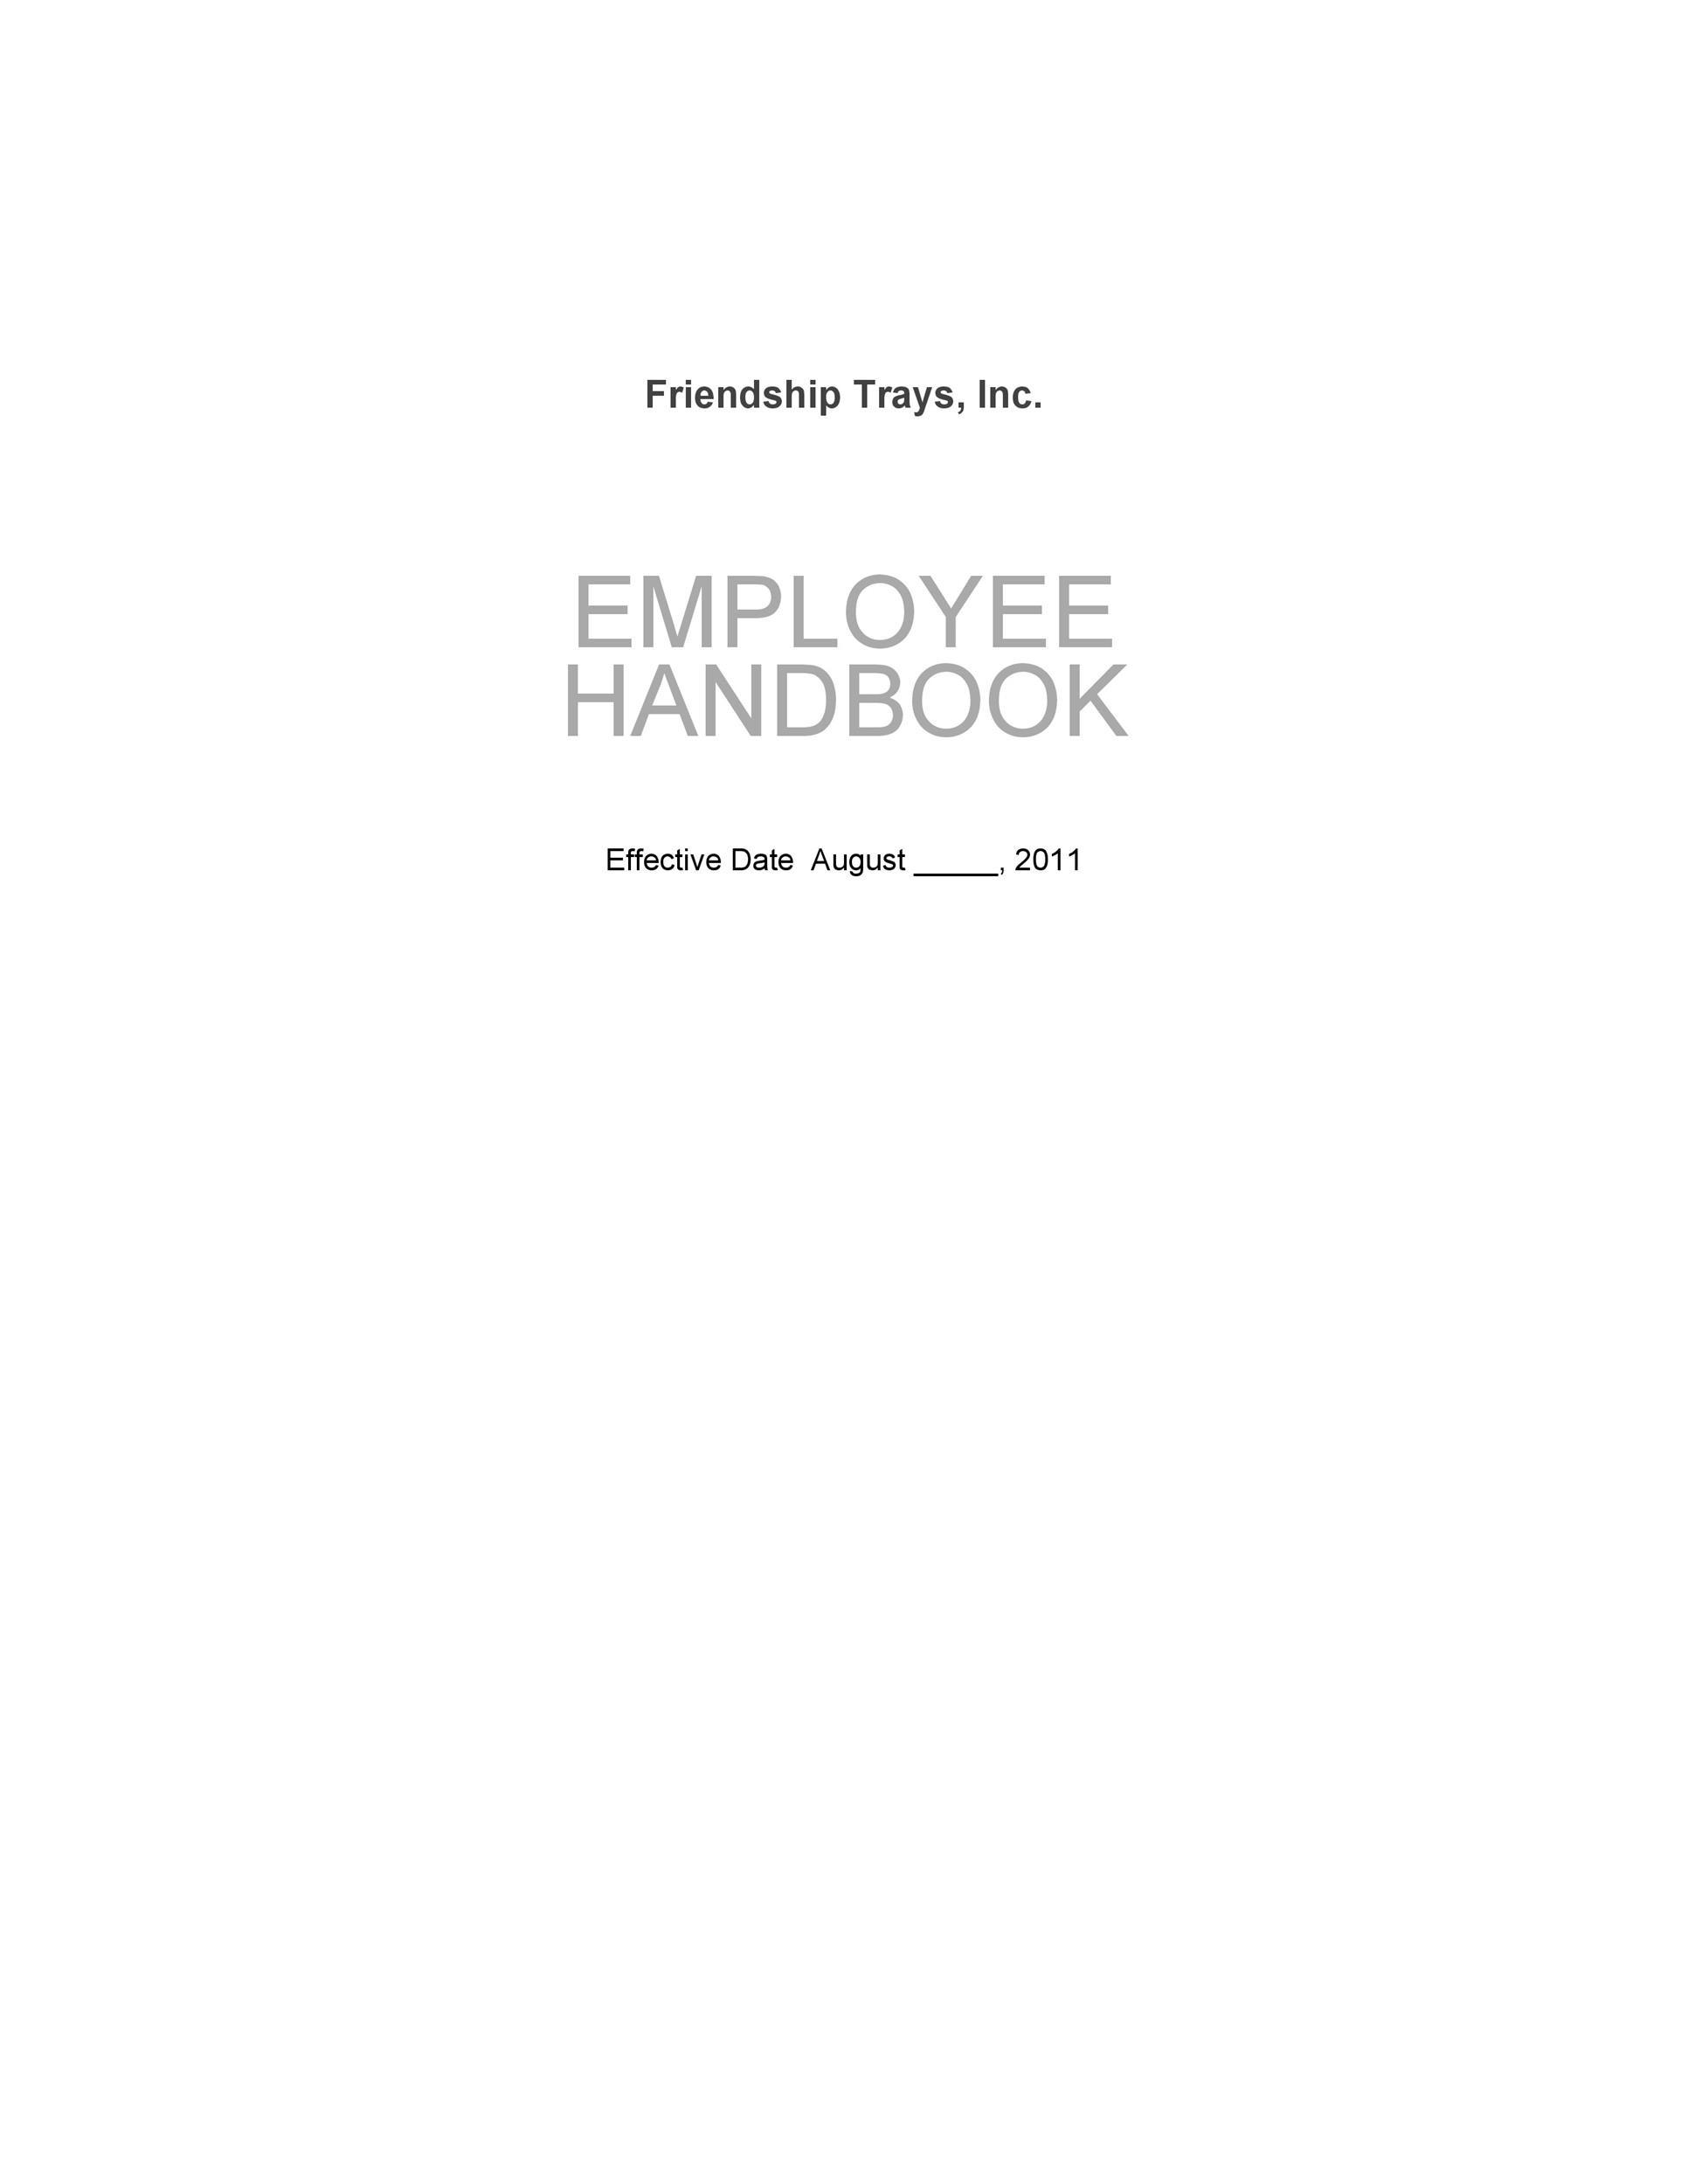 Free employee handbook template 03